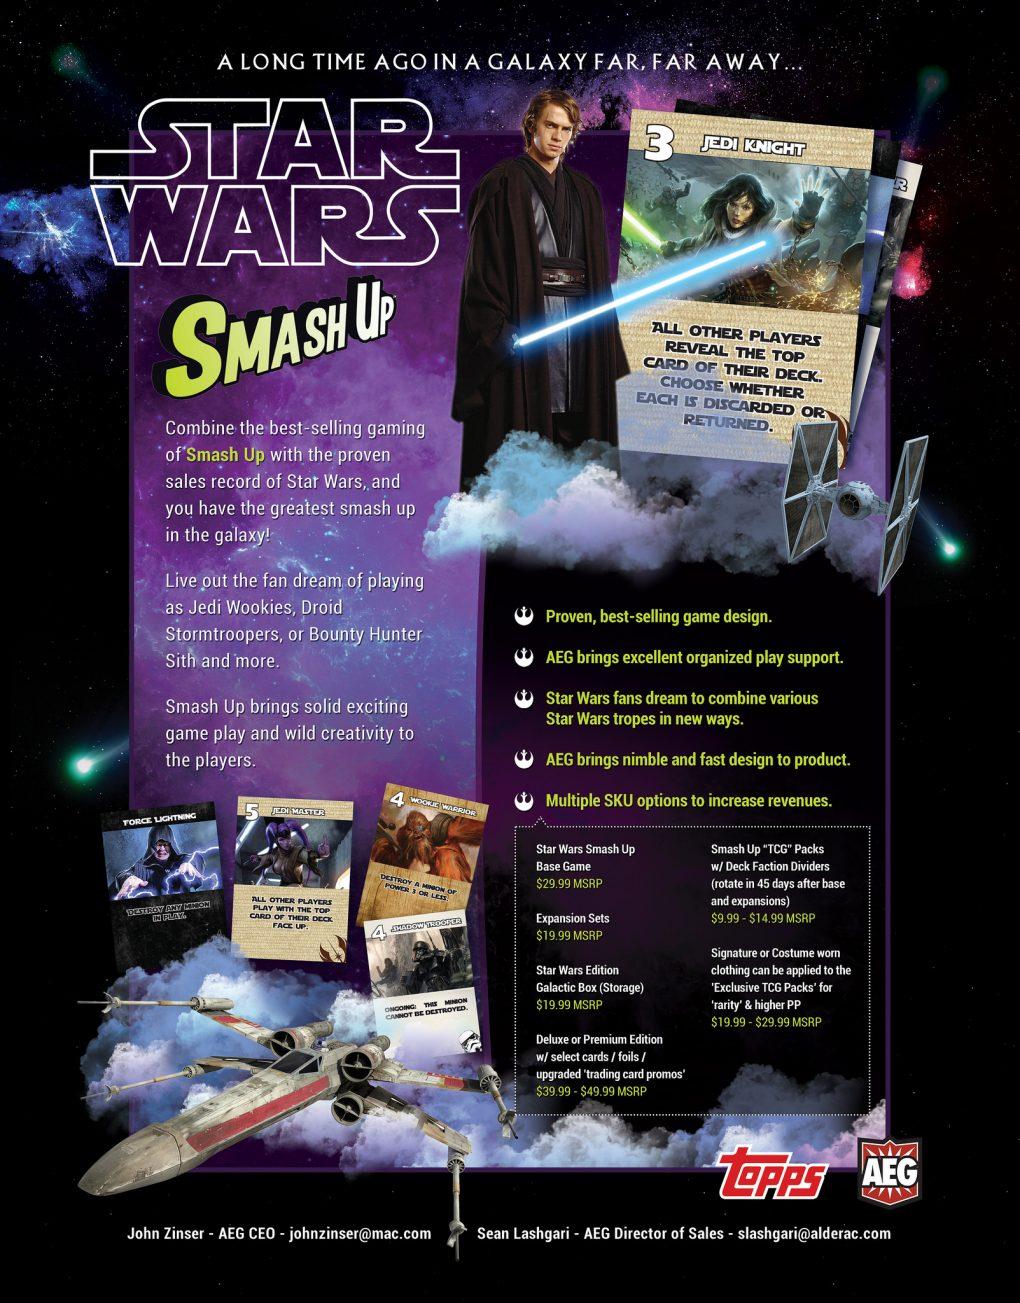 Star Wars Smash Up